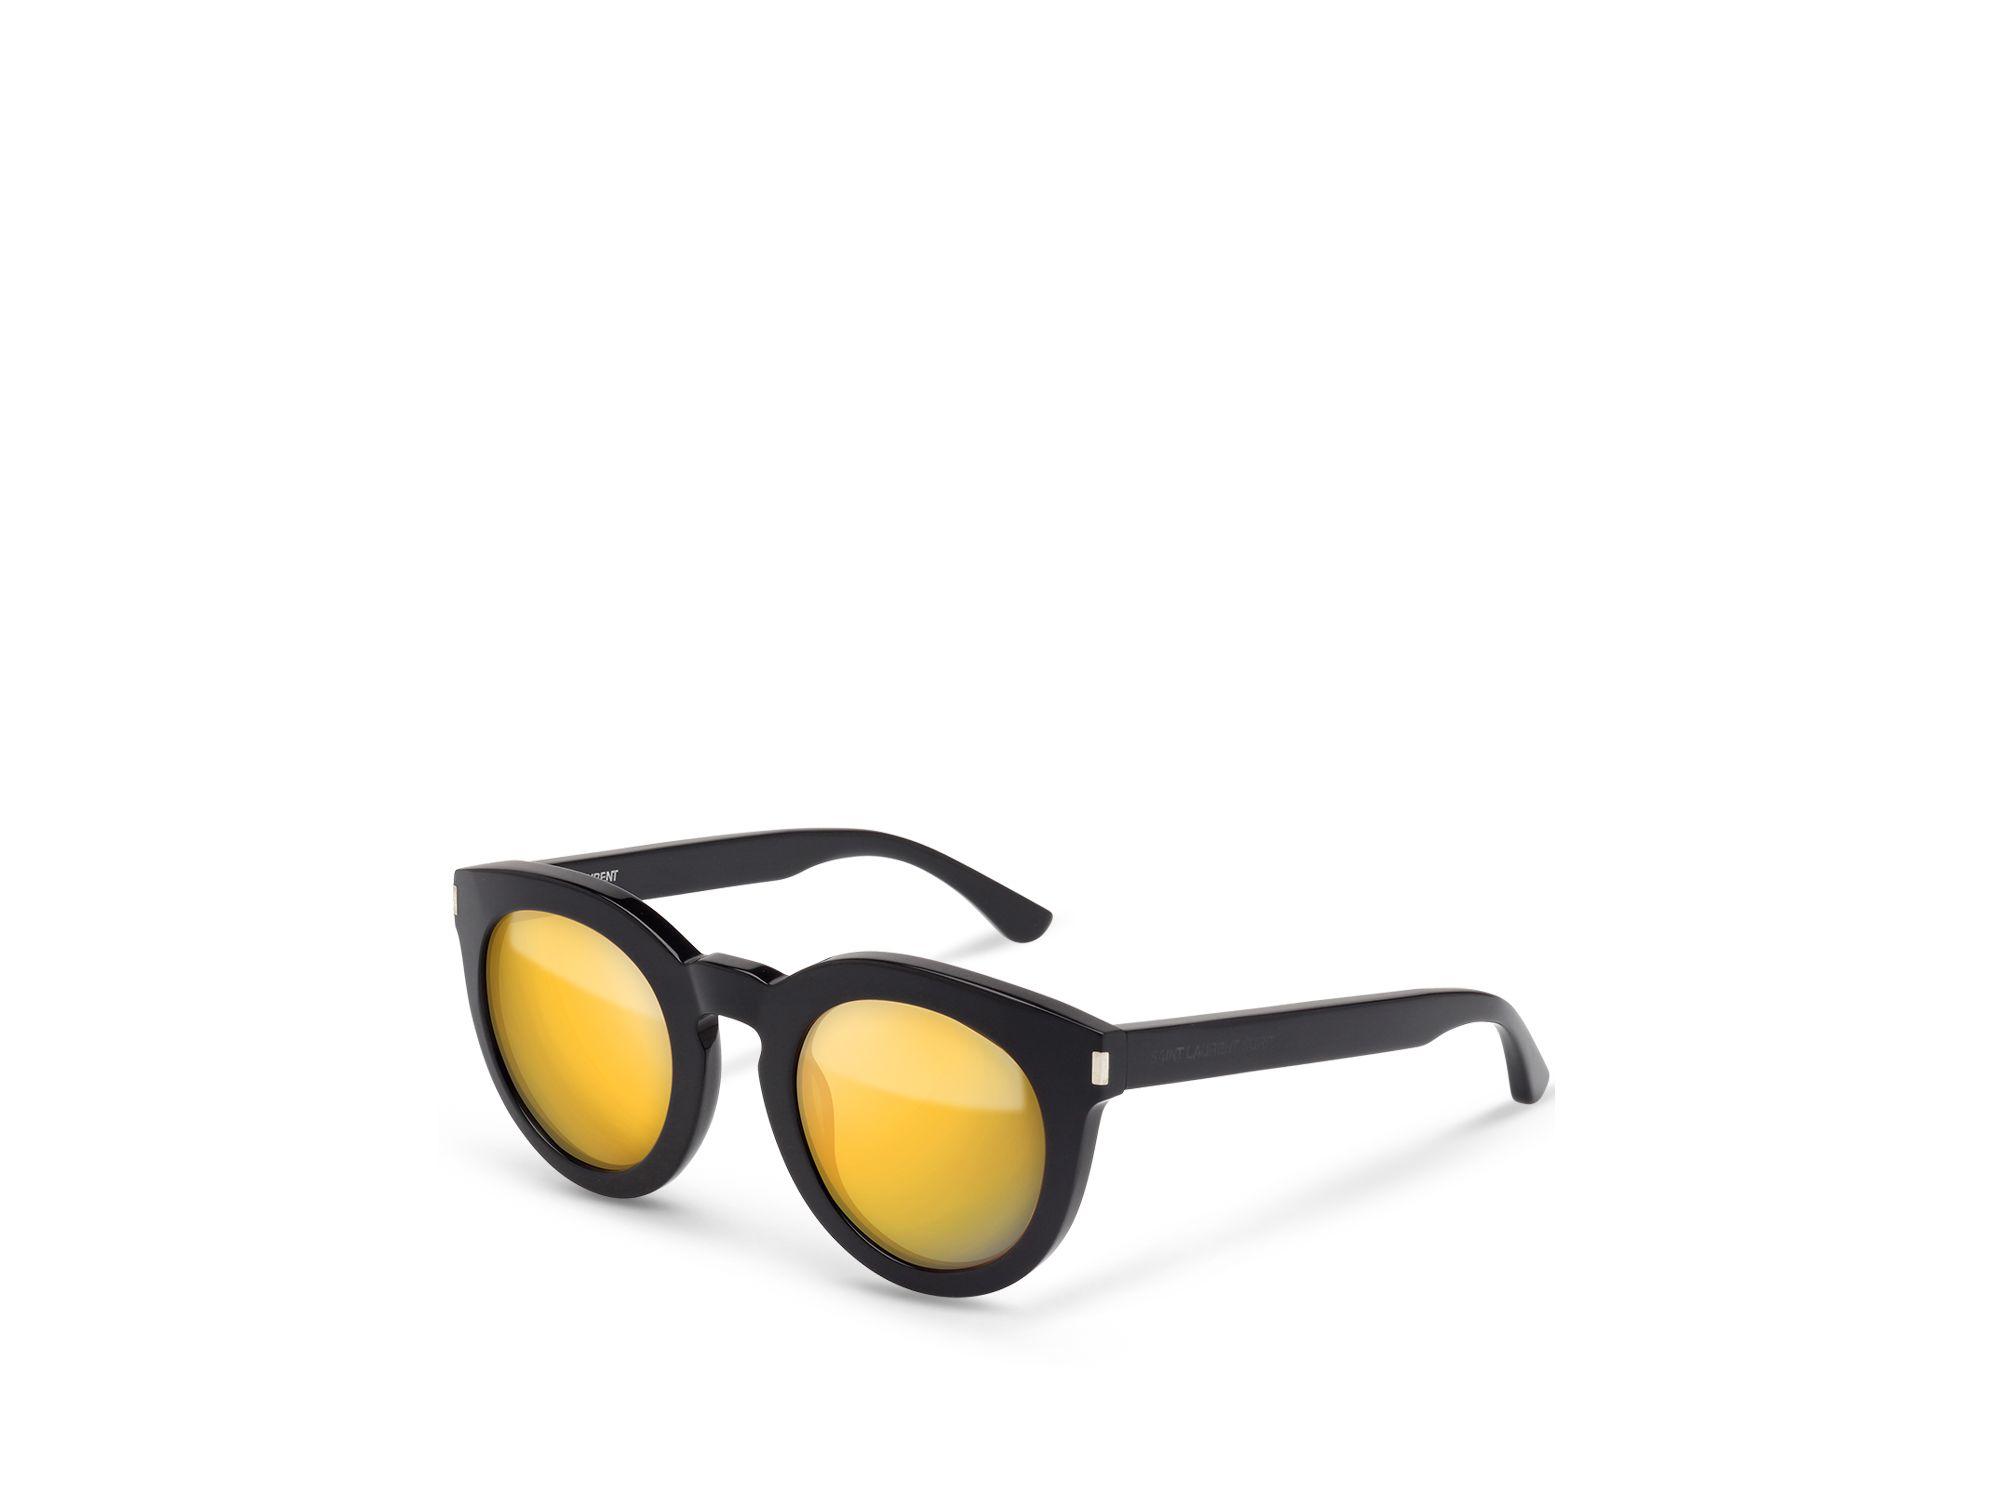 2eb807ee2b7 Saint laurent Surf Mirrored Round Sunglasses